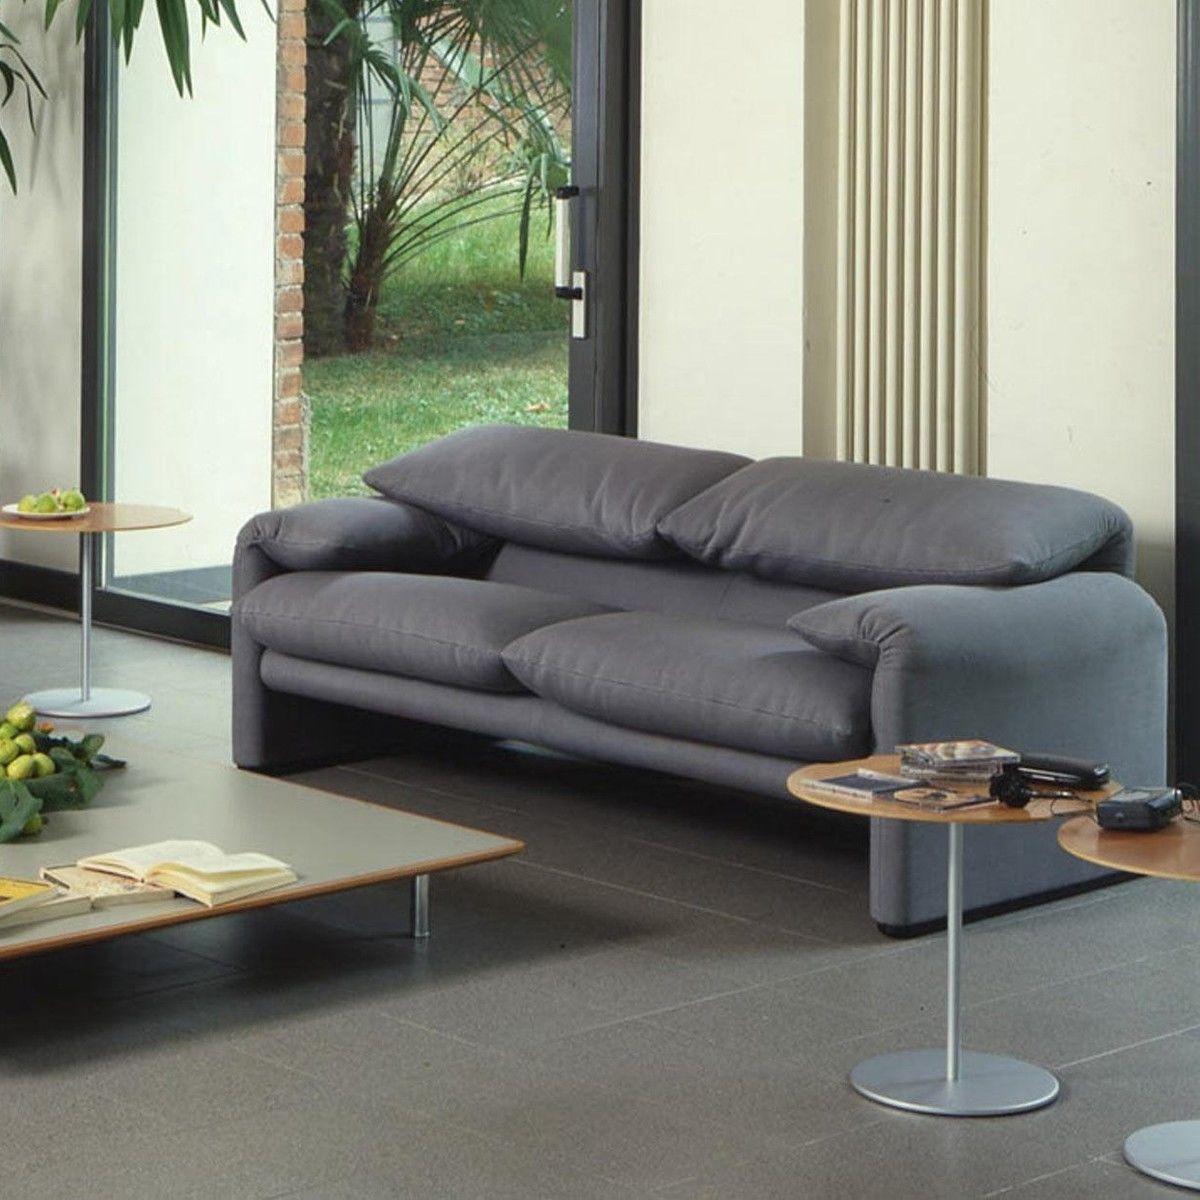 maralunga 40 canap 2 places 166x86cm cassina. Black Bedroom Furniture Sets. Home Design Ideas